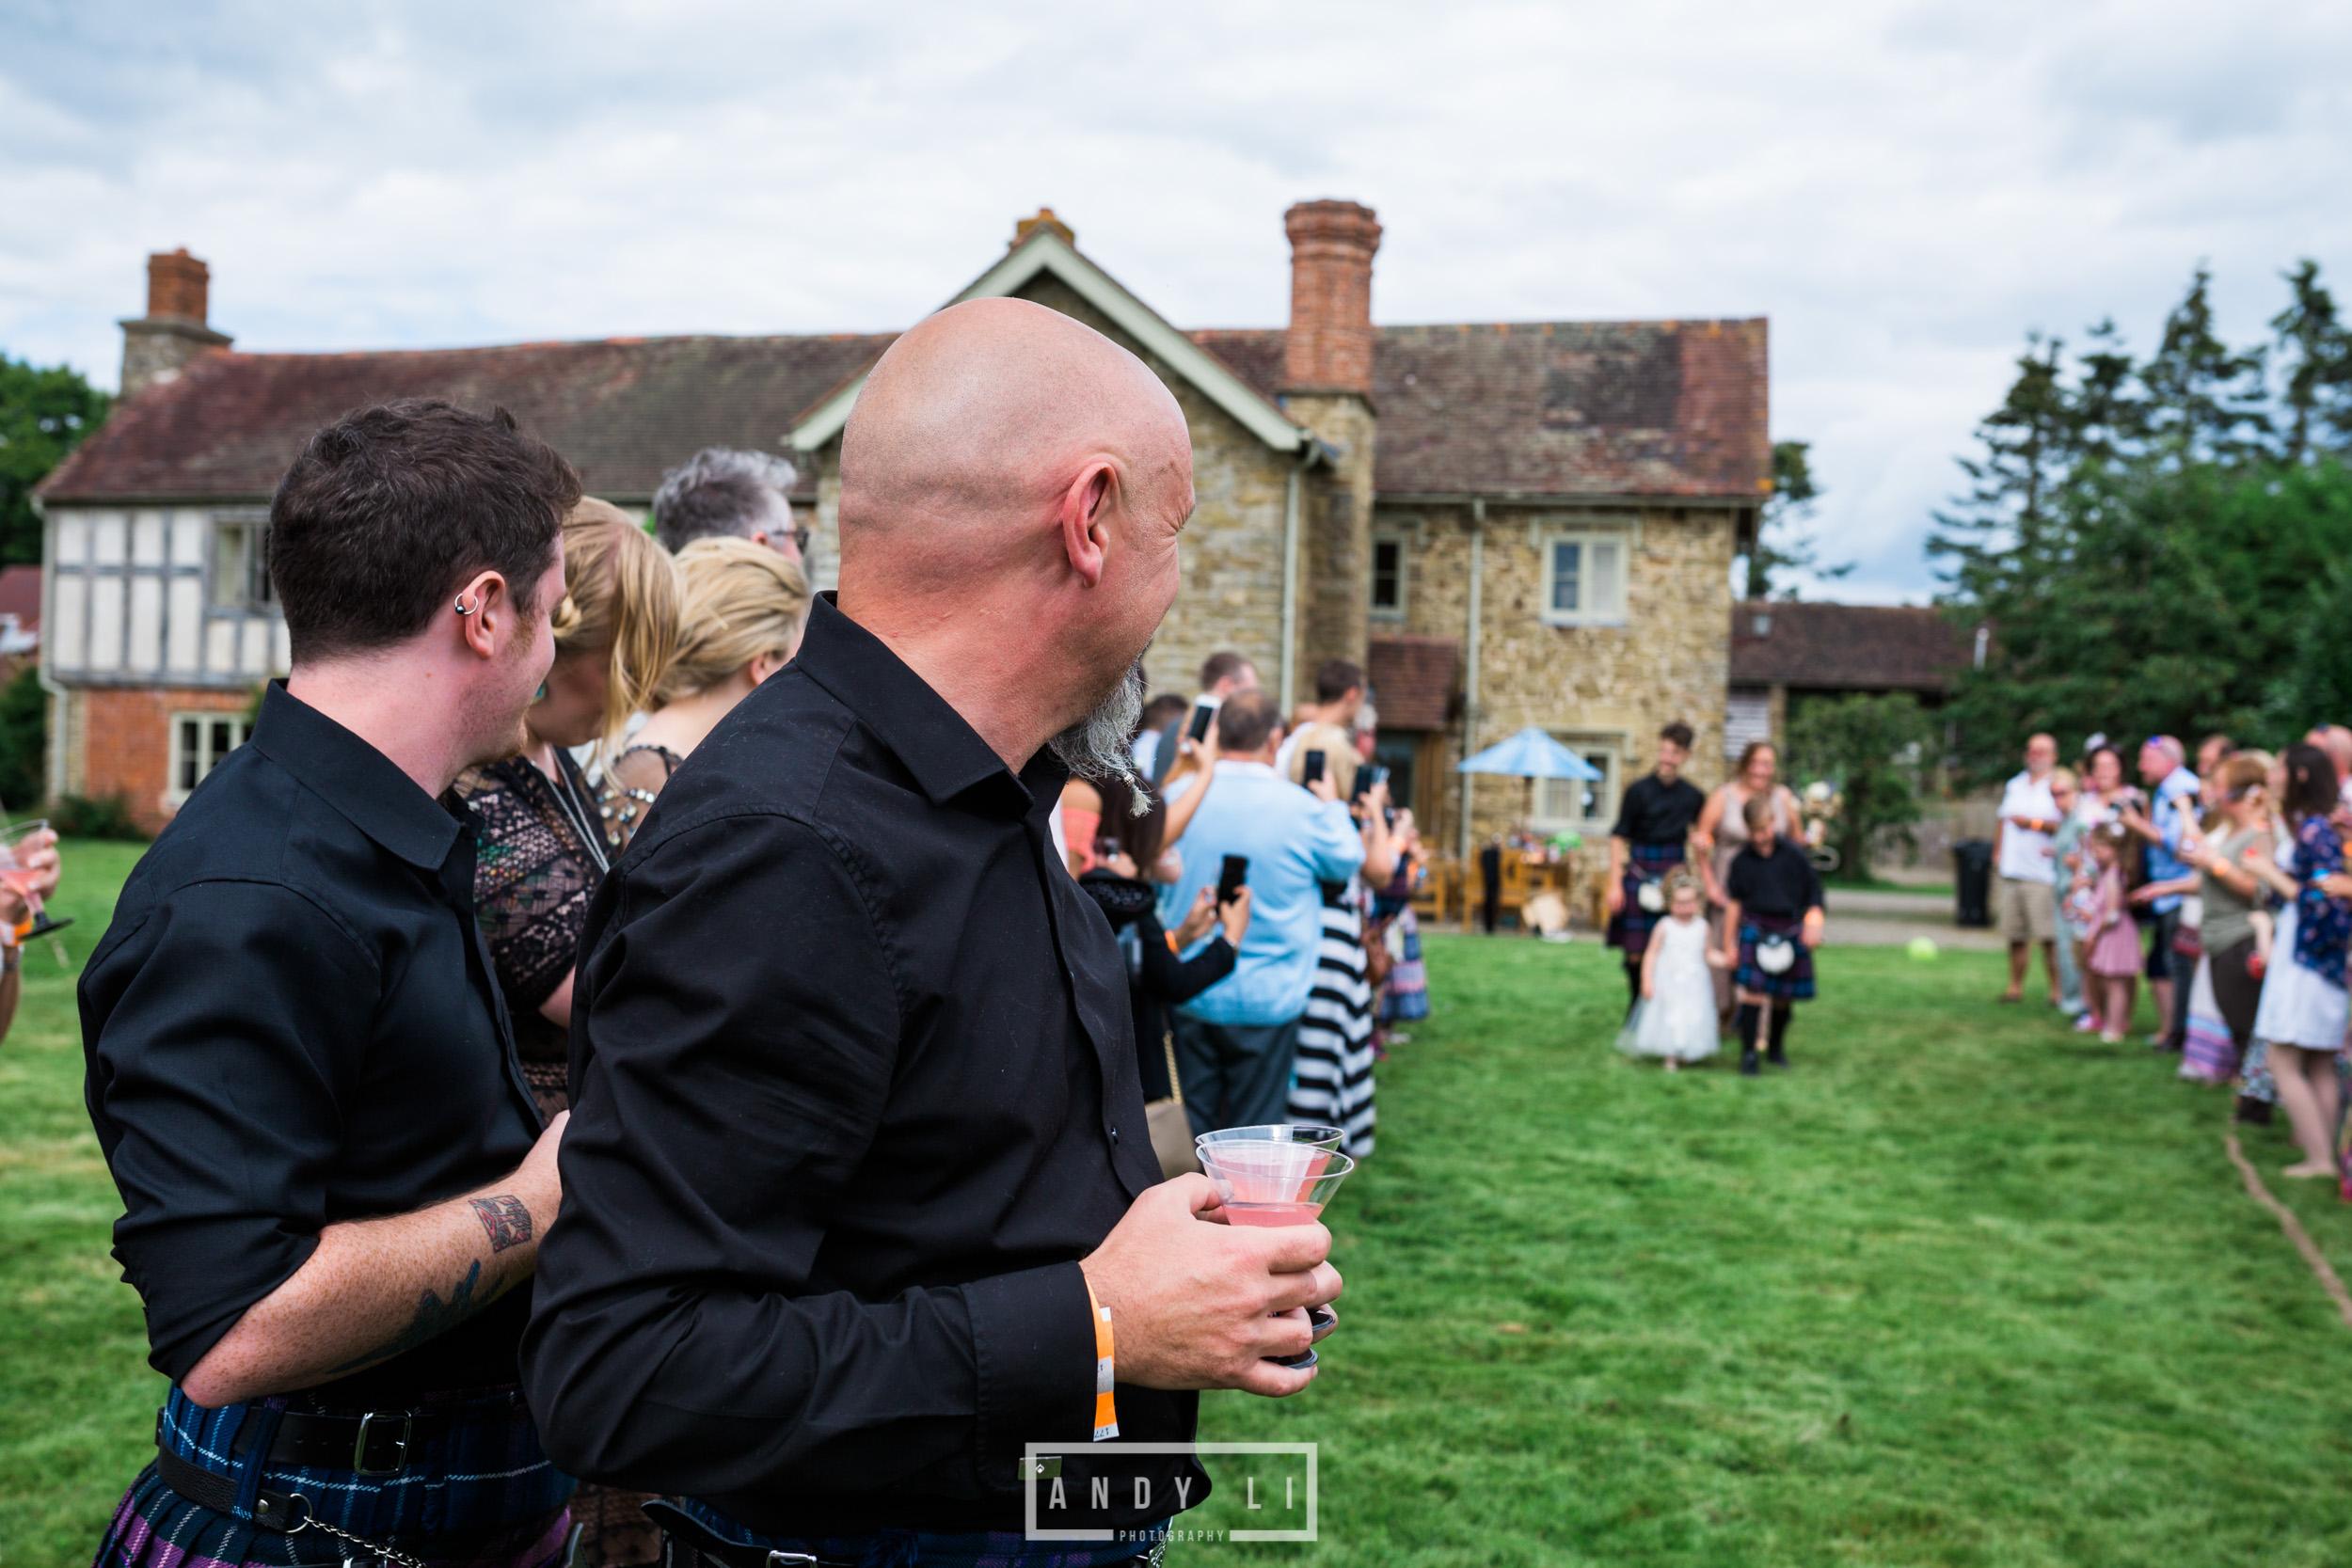 Festival Wedding Shropshire-Andy Li Photography-124.jpg